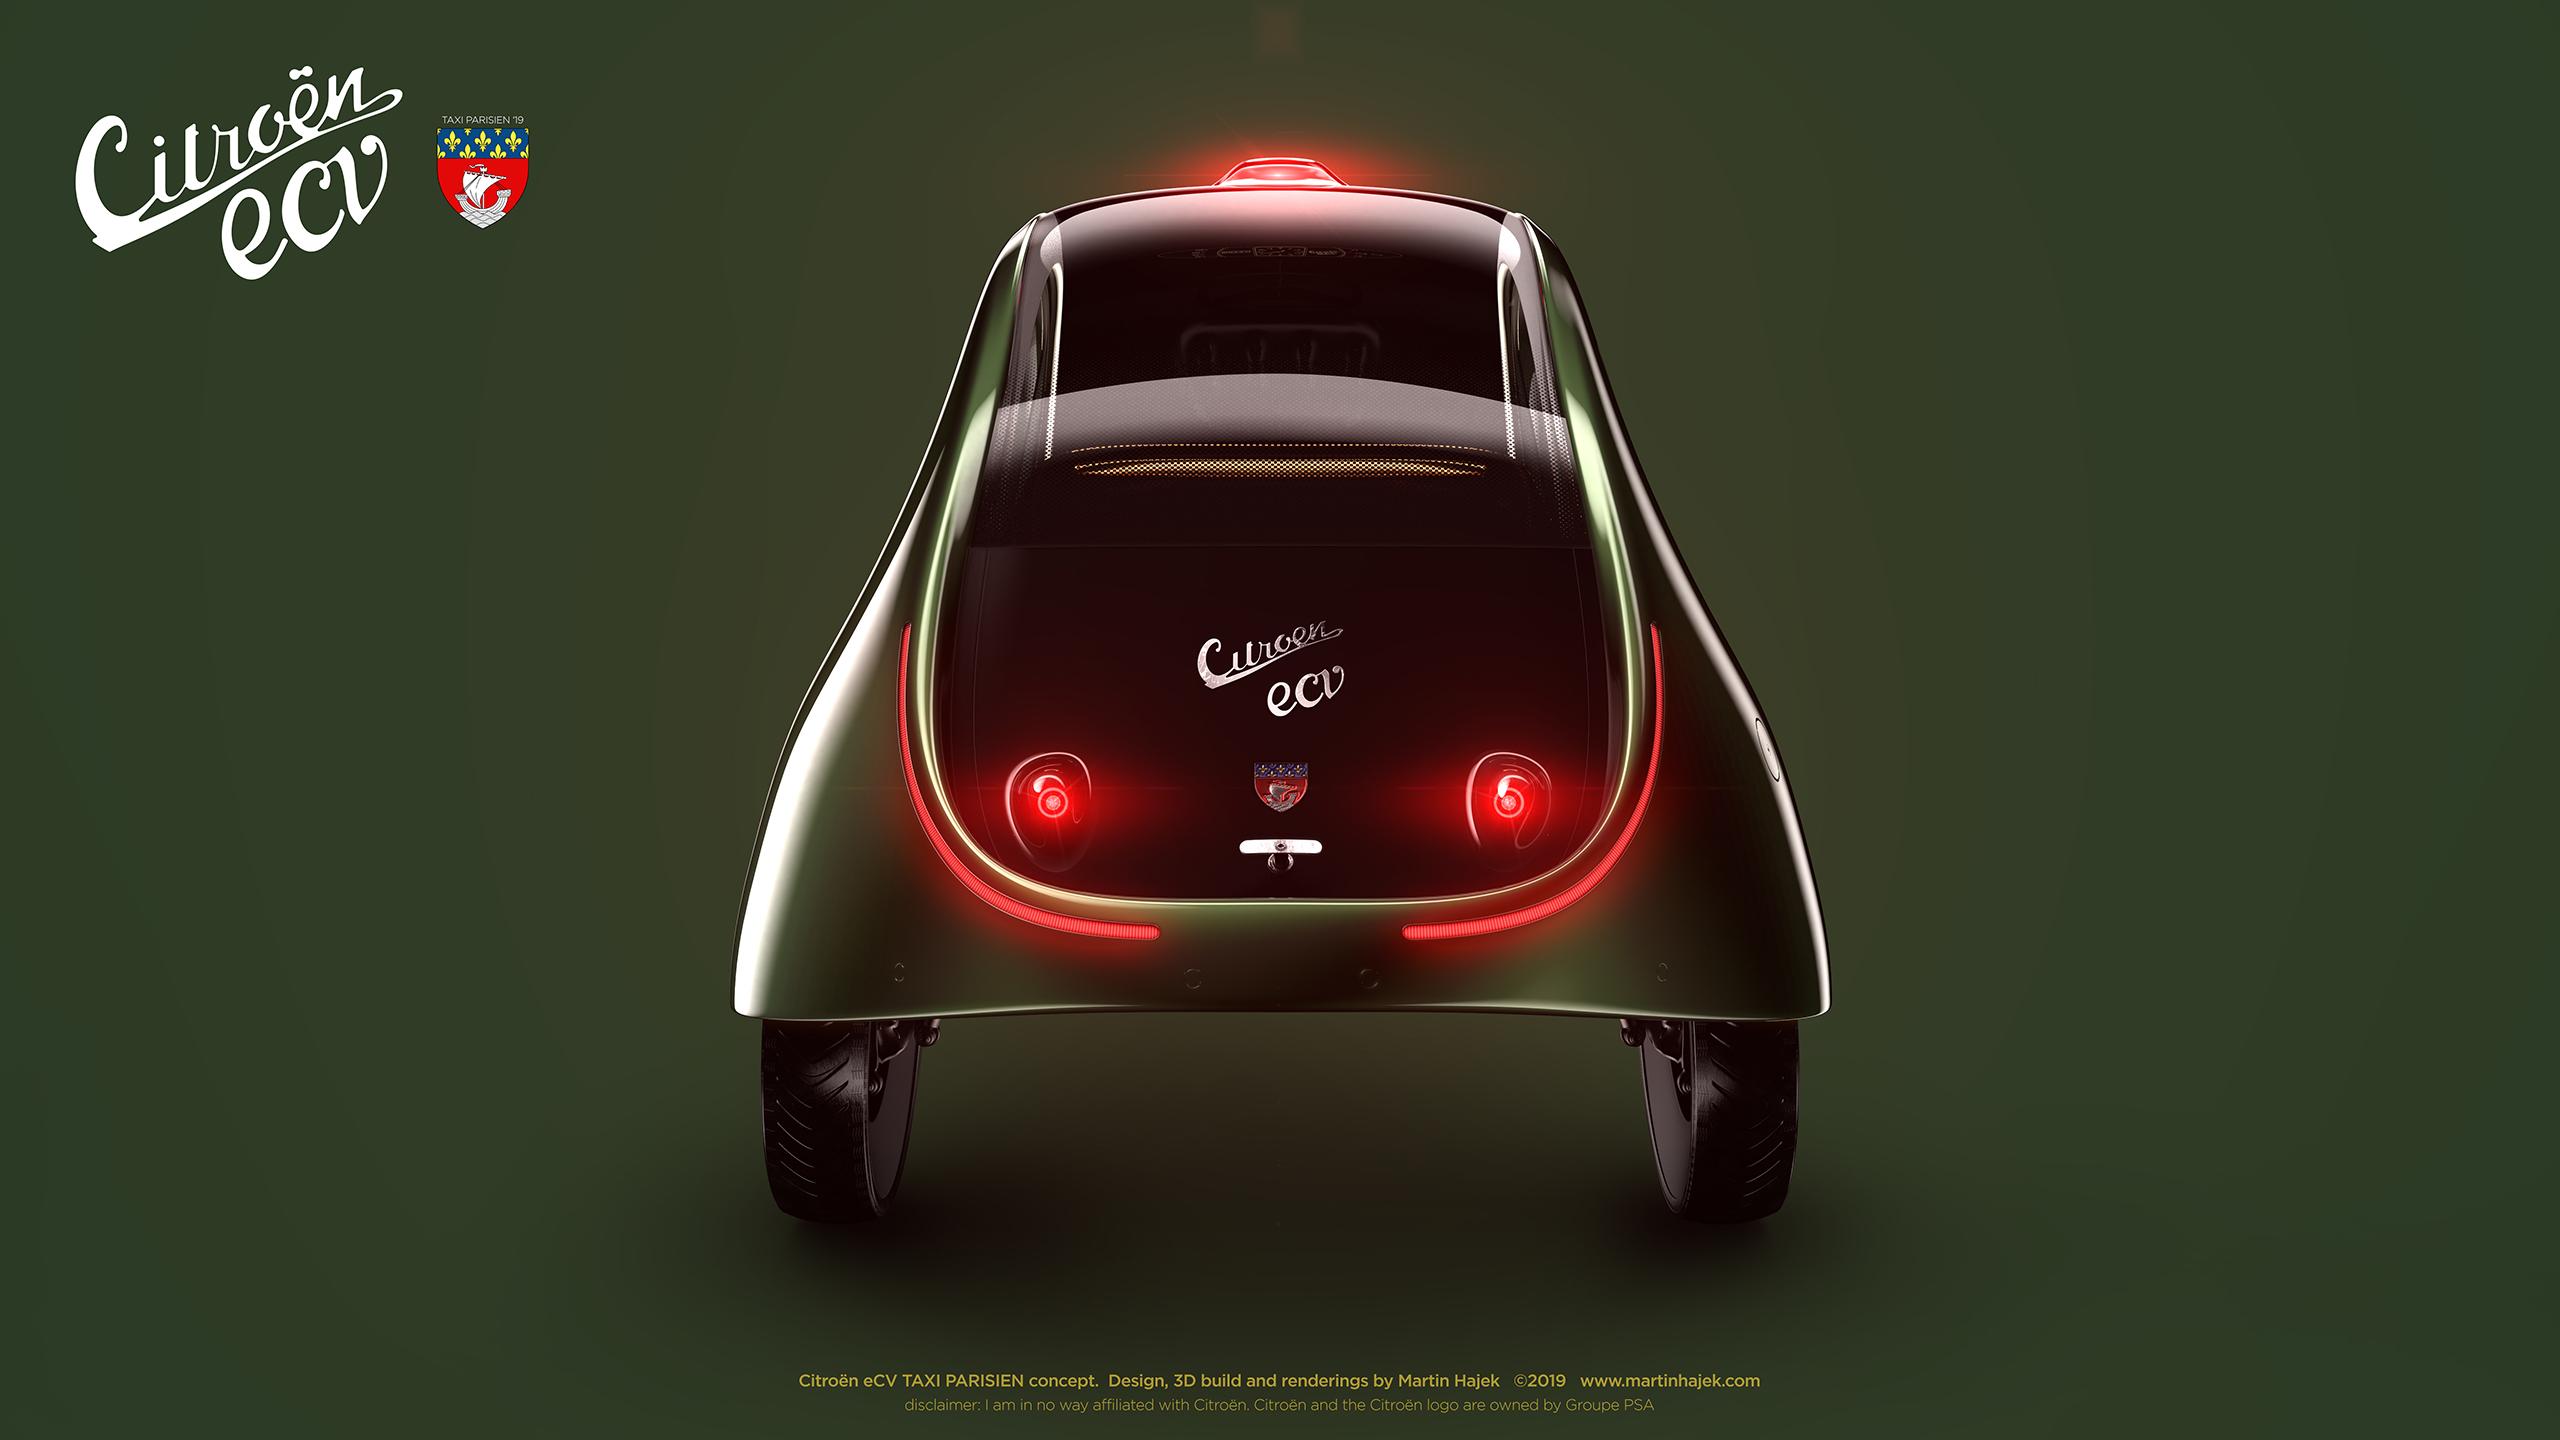 Citroen eCV TAXI PARISIEN concept